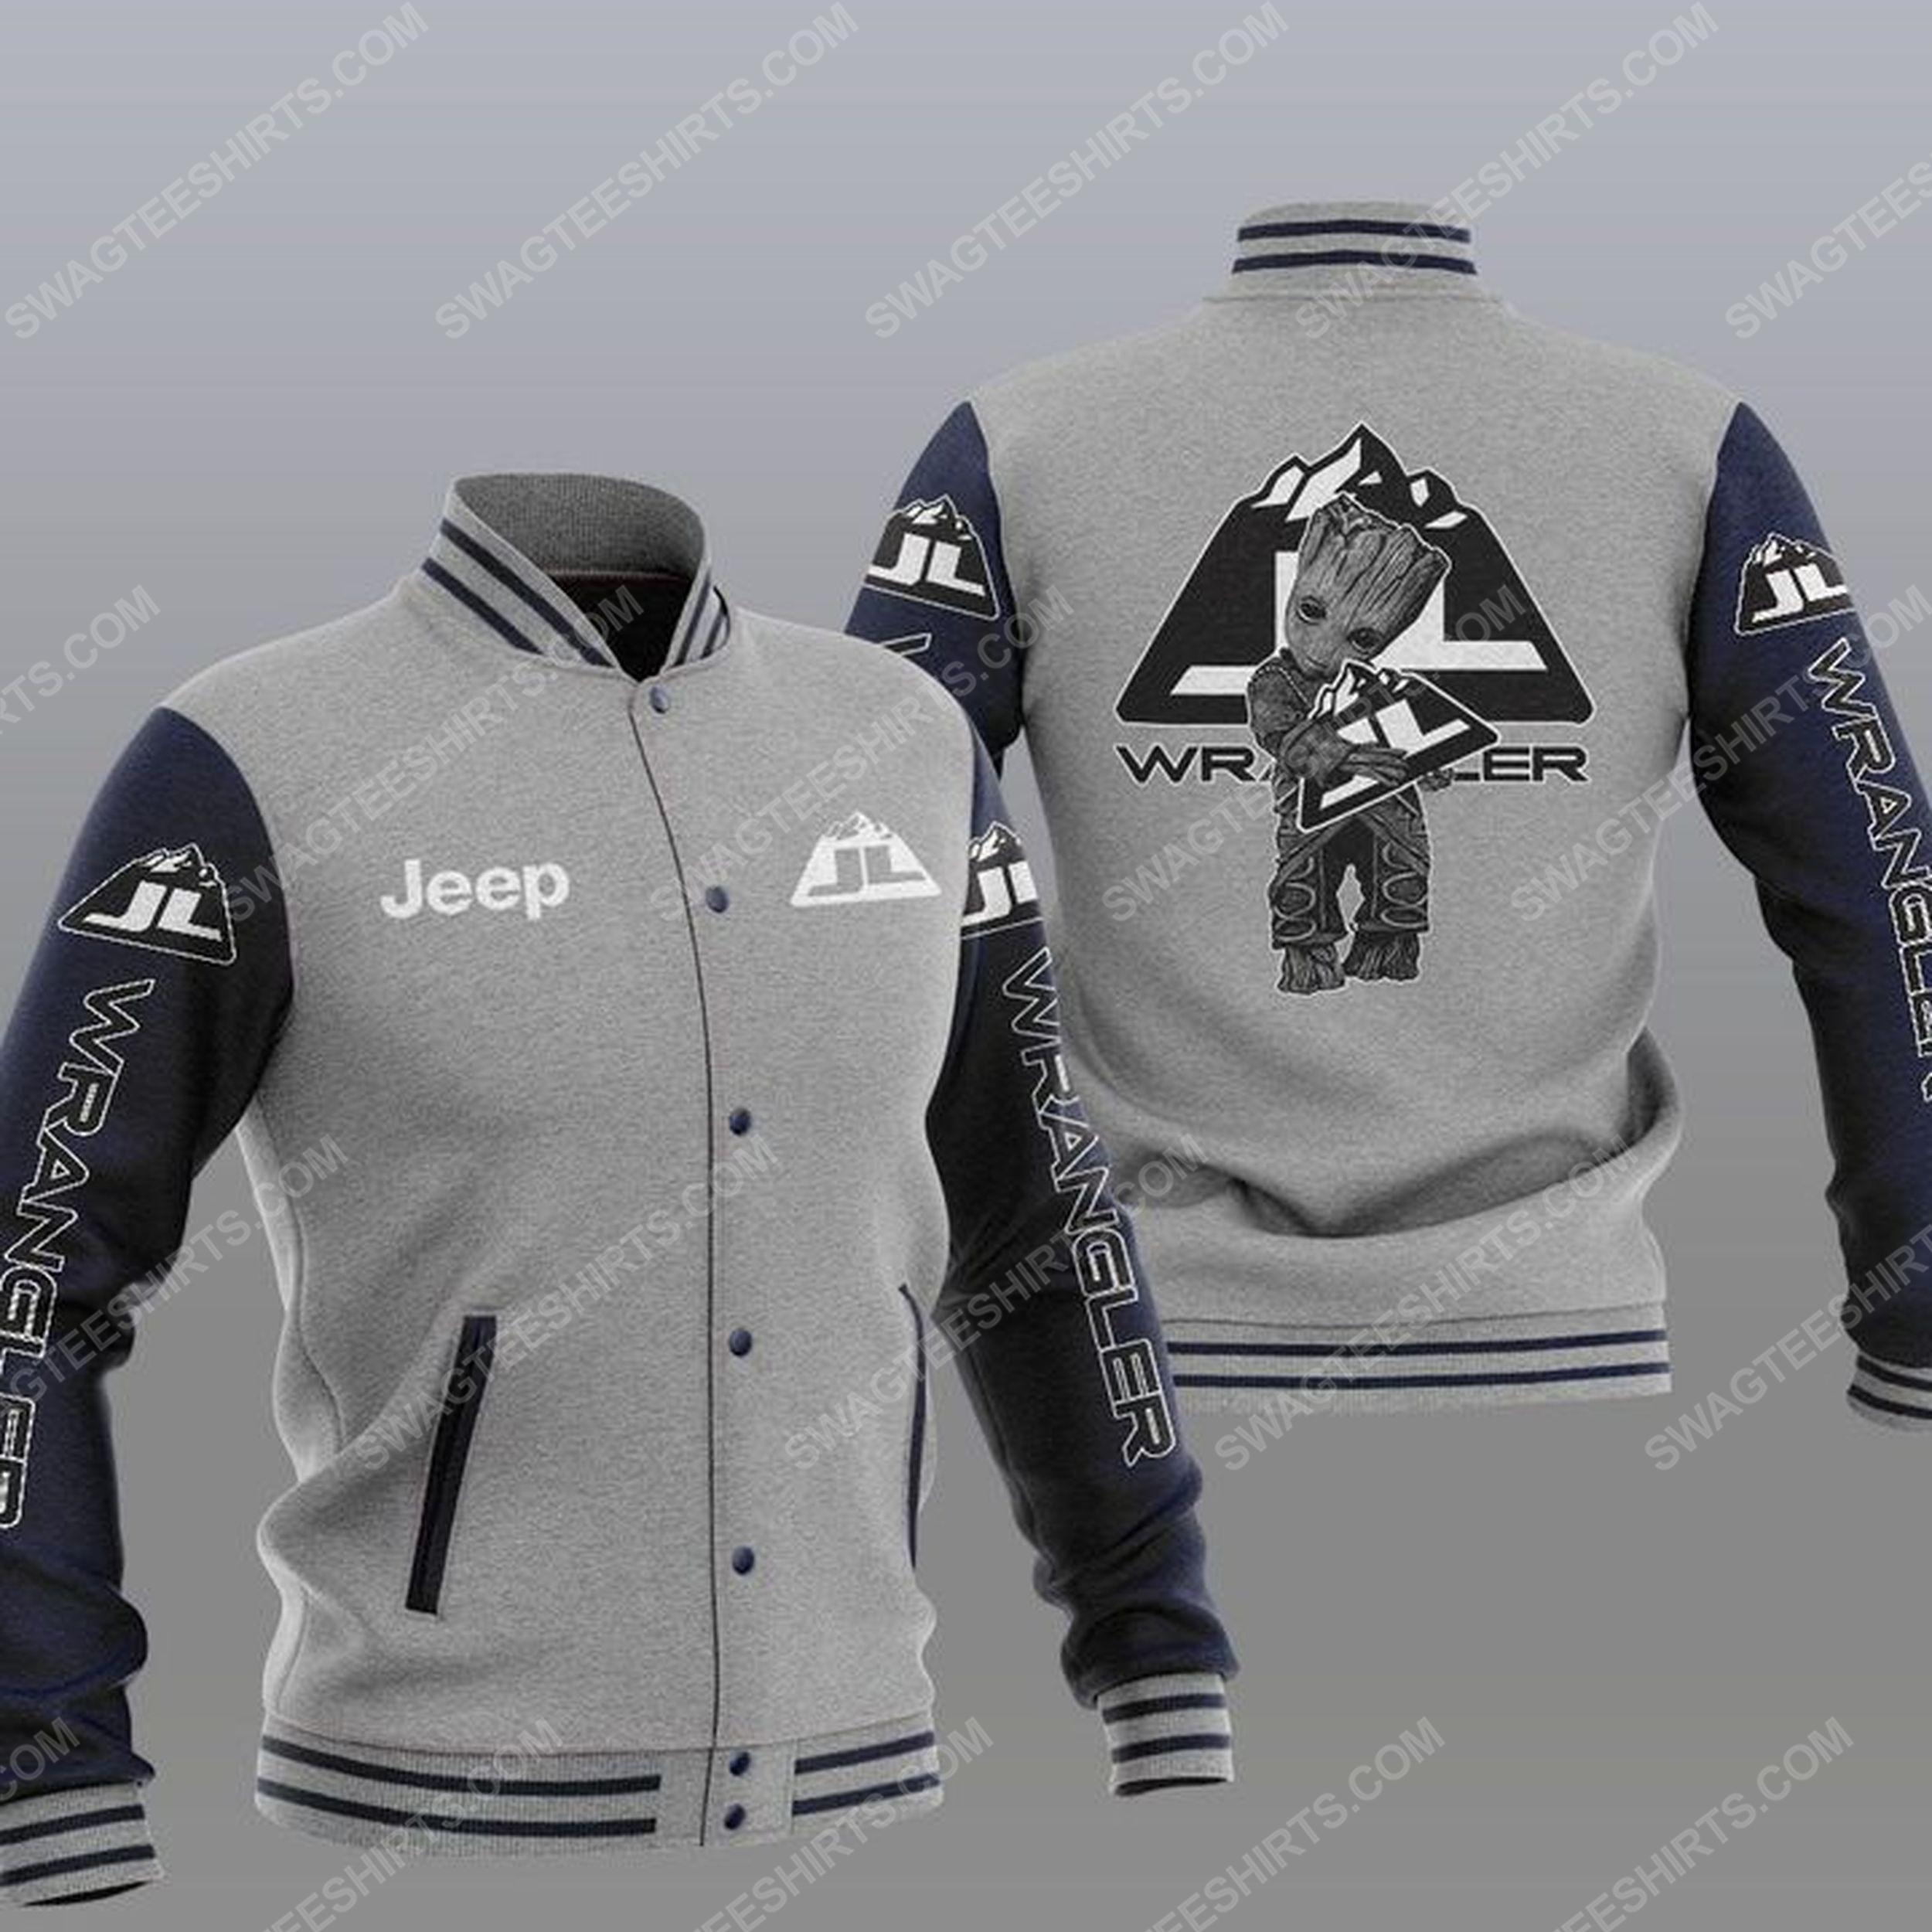 Baby groot and jeep wrangler all over print baseball jacket - gray 1